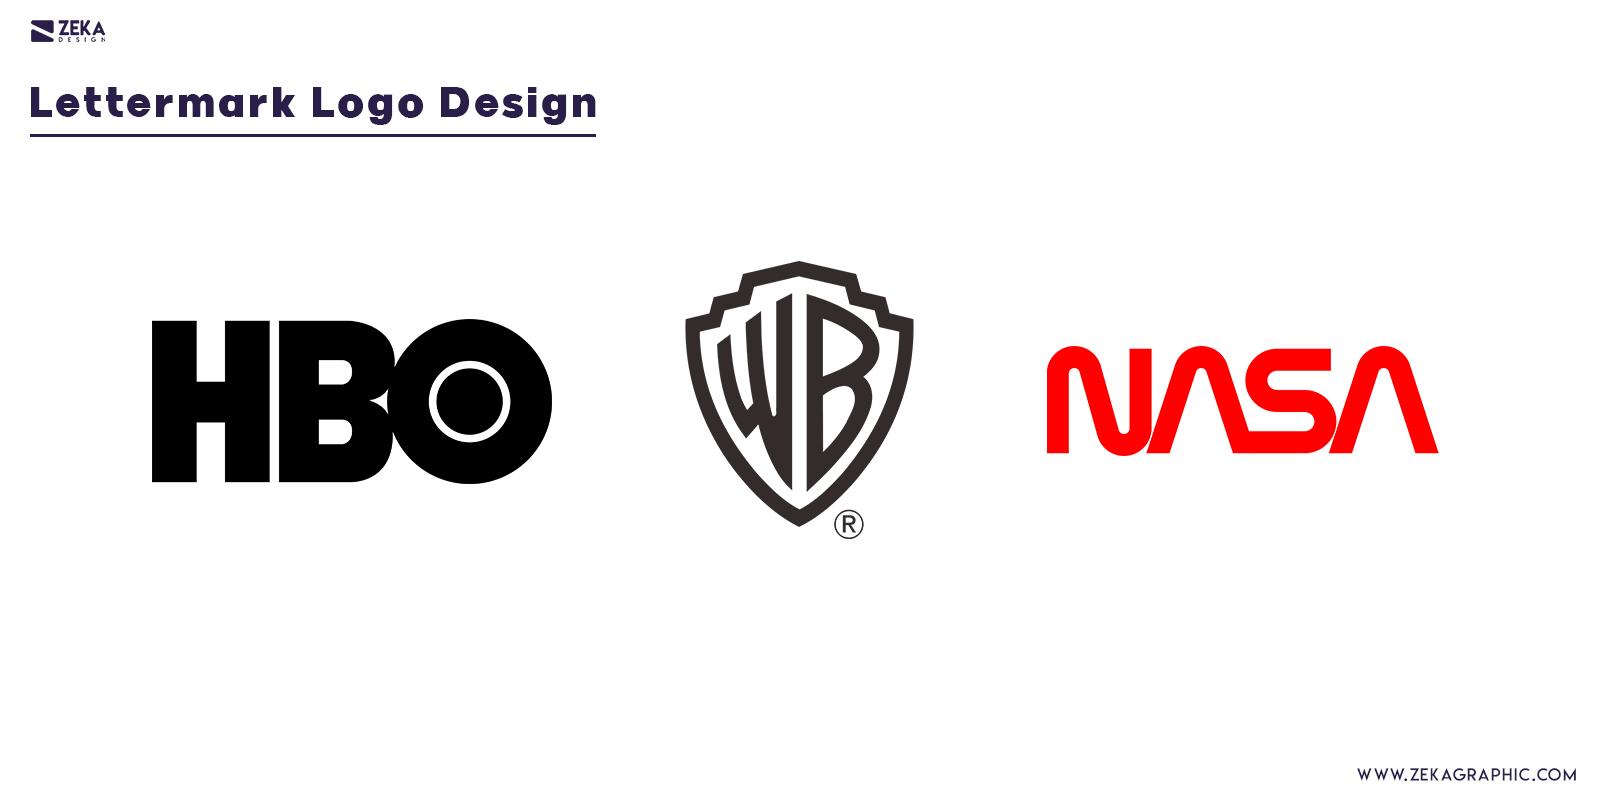 Lettermark Logo Design Type Graphic Design Blog Inspiration